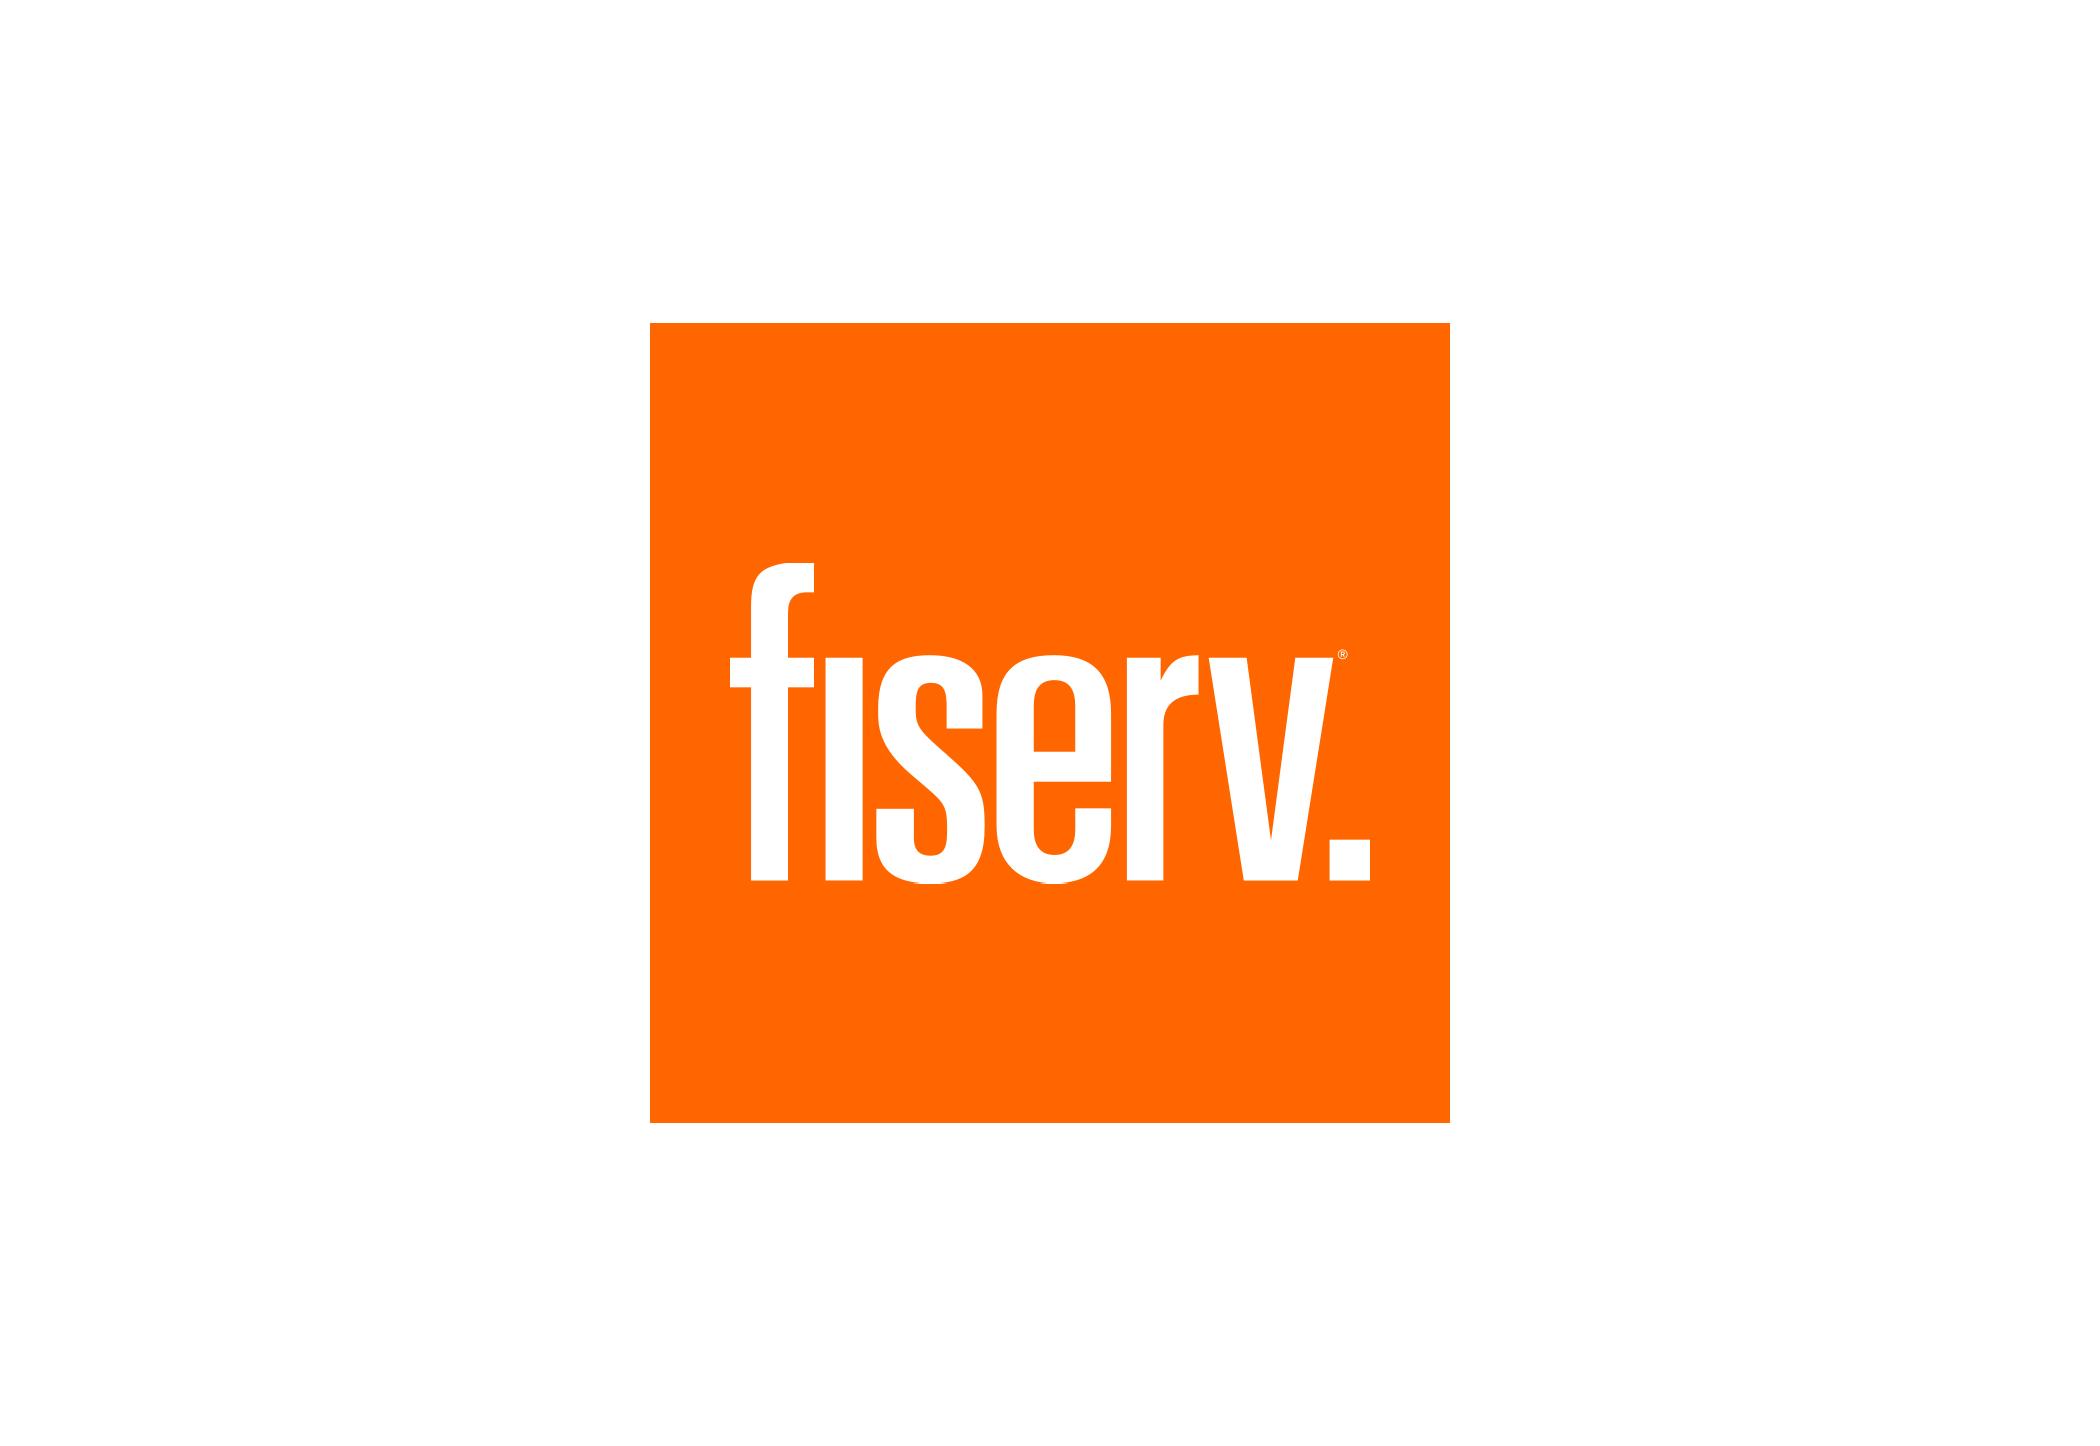 Fiserv logo.